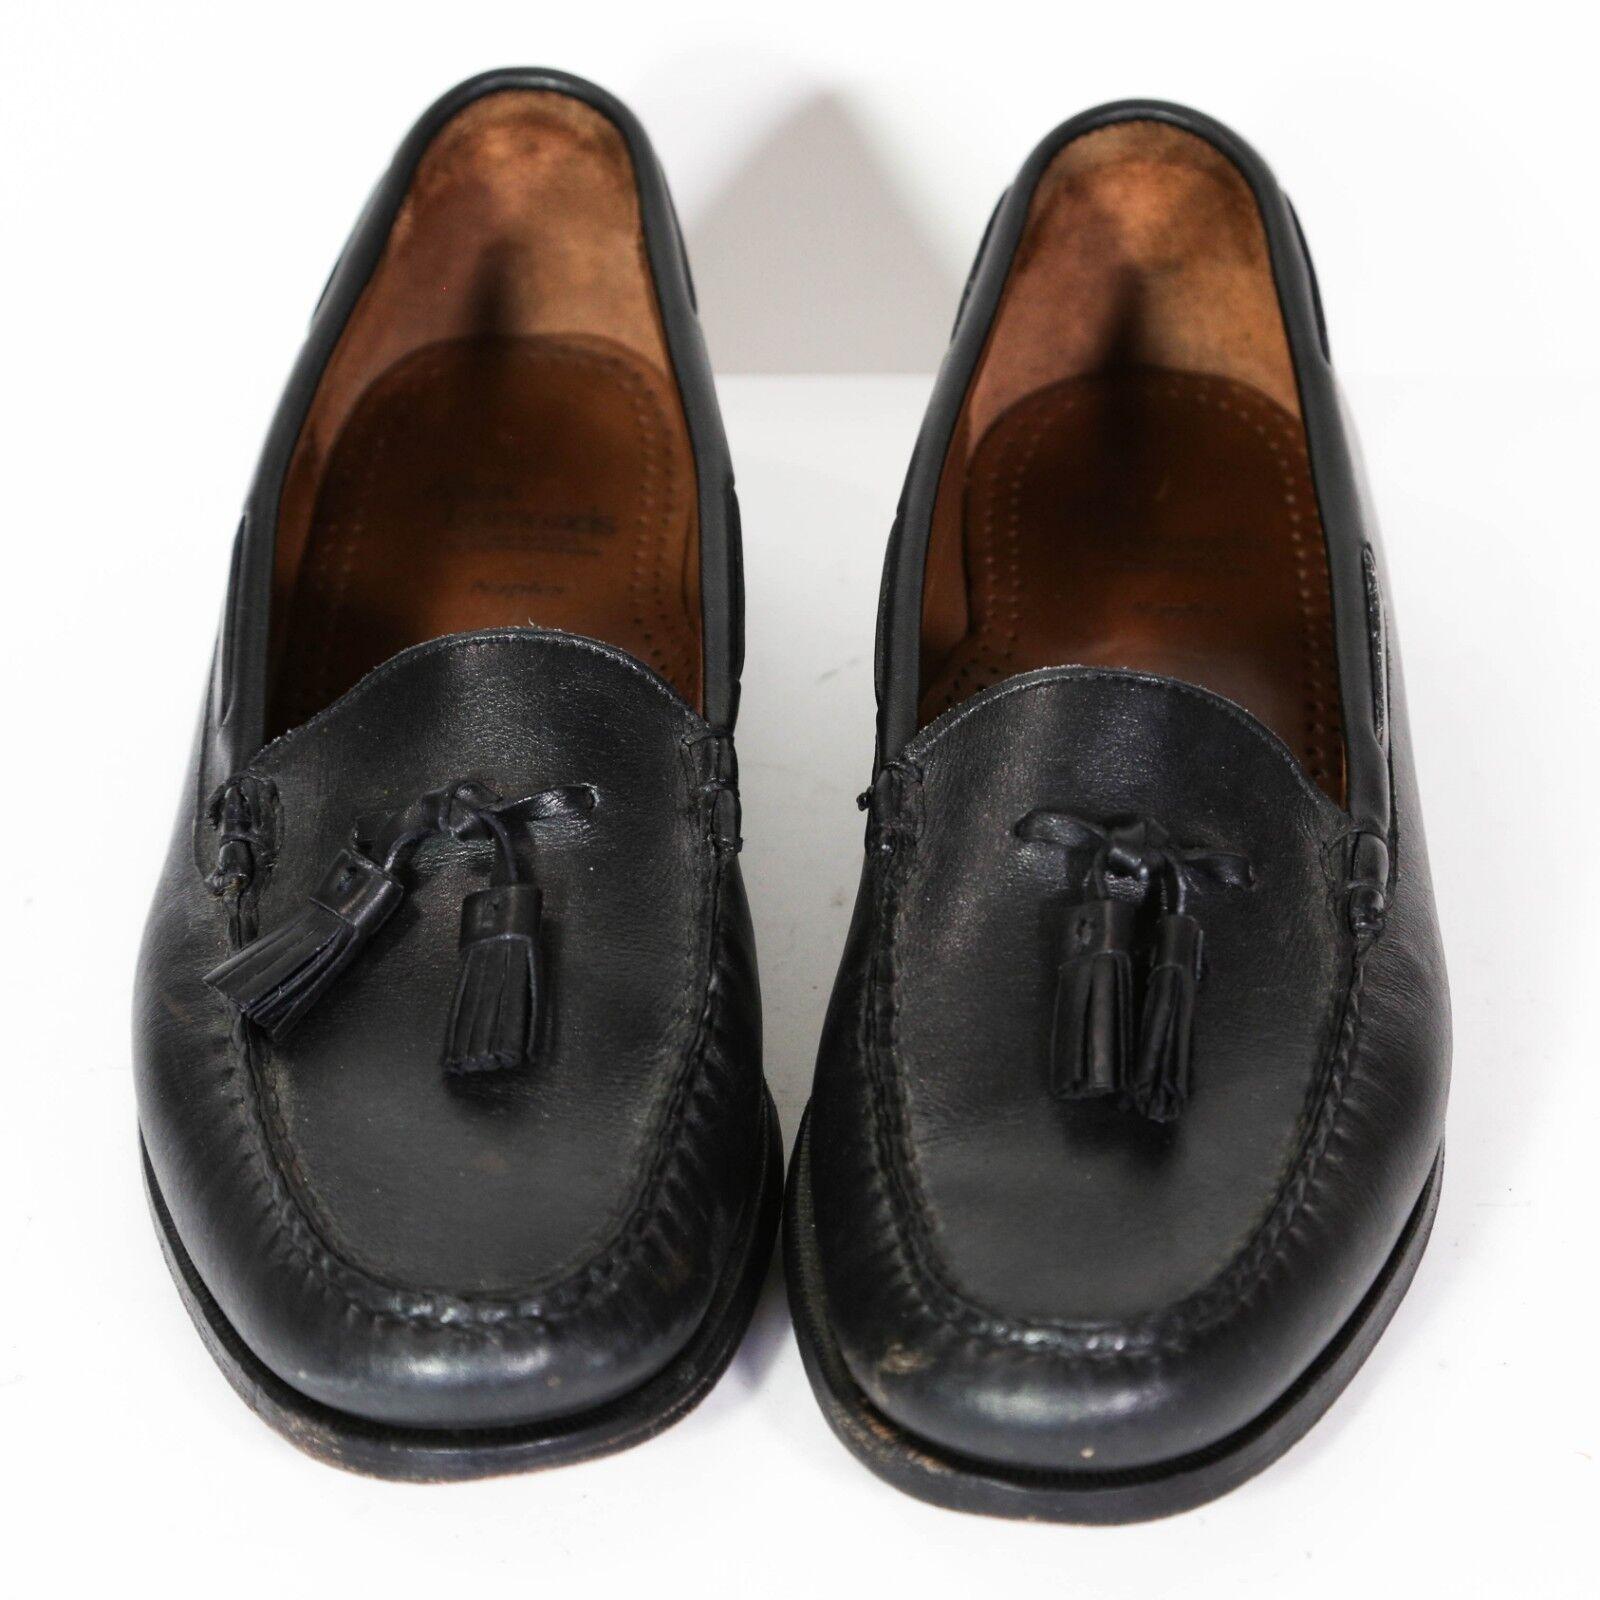 Allen Edmonds Naples Mens Loafers Size 11.5 B Black Leather Slip On Tassel EUC